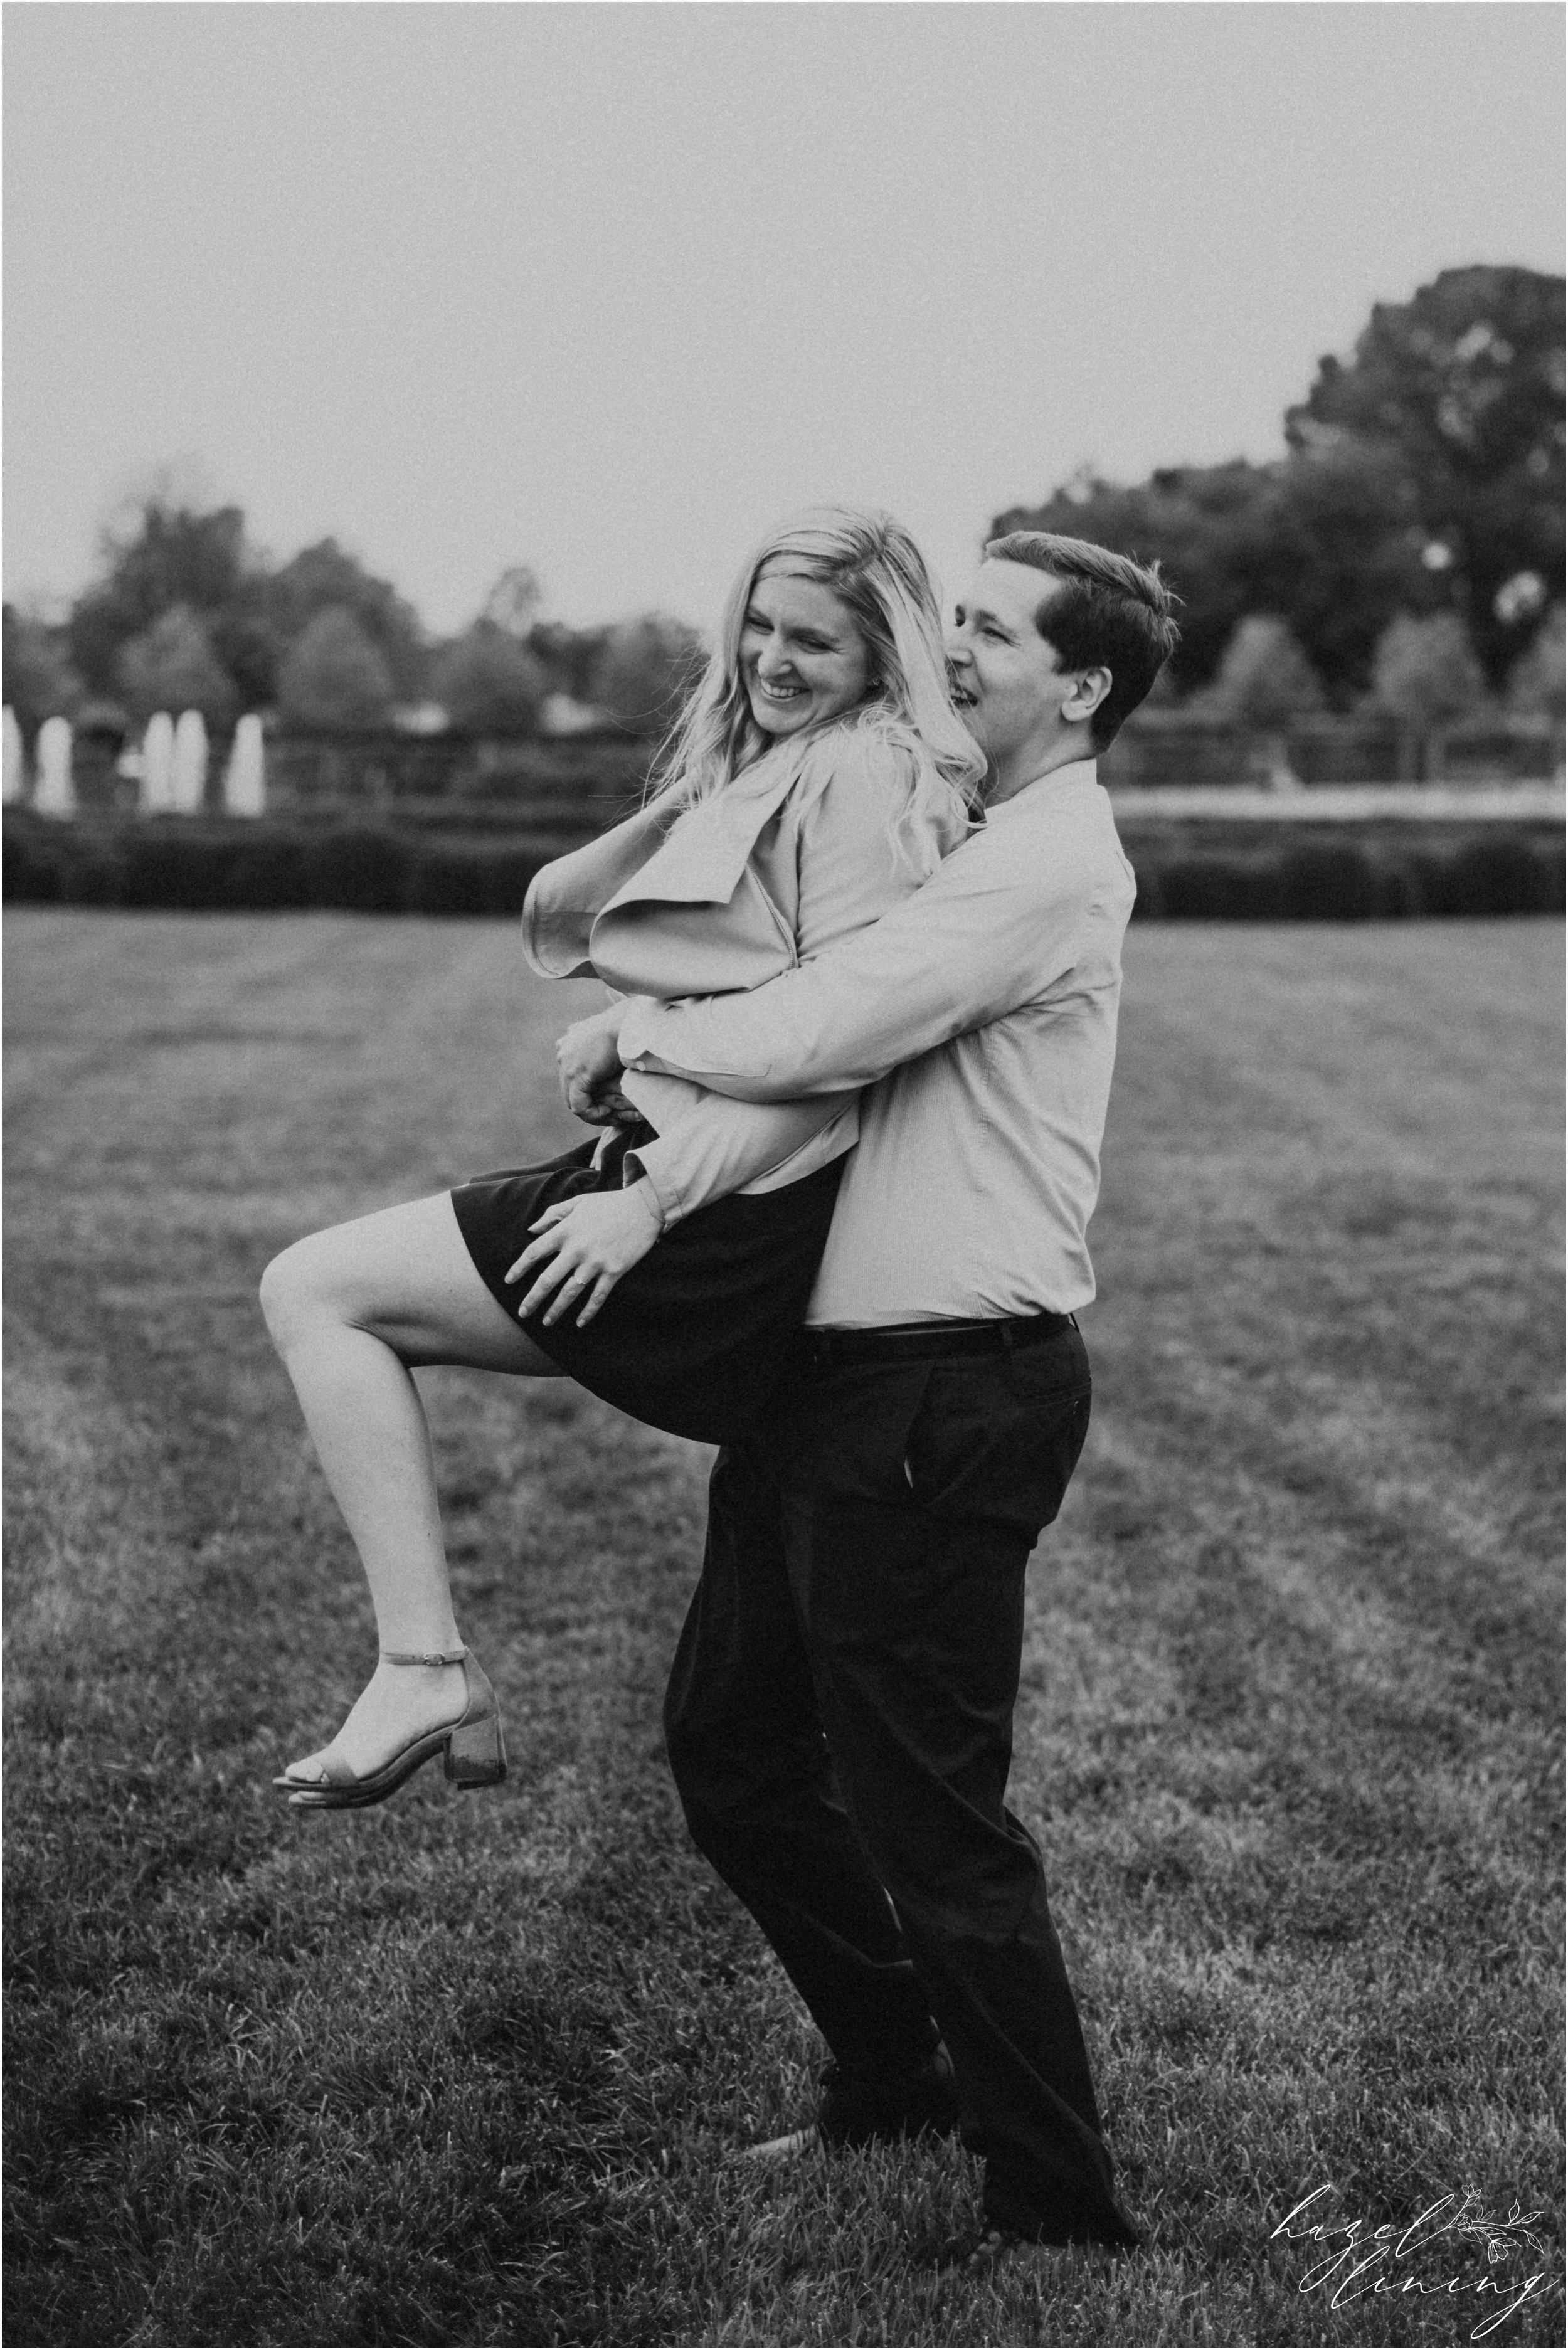 victoria-travis-logan-mayes-longwood-gardens-kennett-square-philadelphia-engagement-session-hazel-lining-photography-destination-elopement-wedding-engagement-photography_0016.jpg